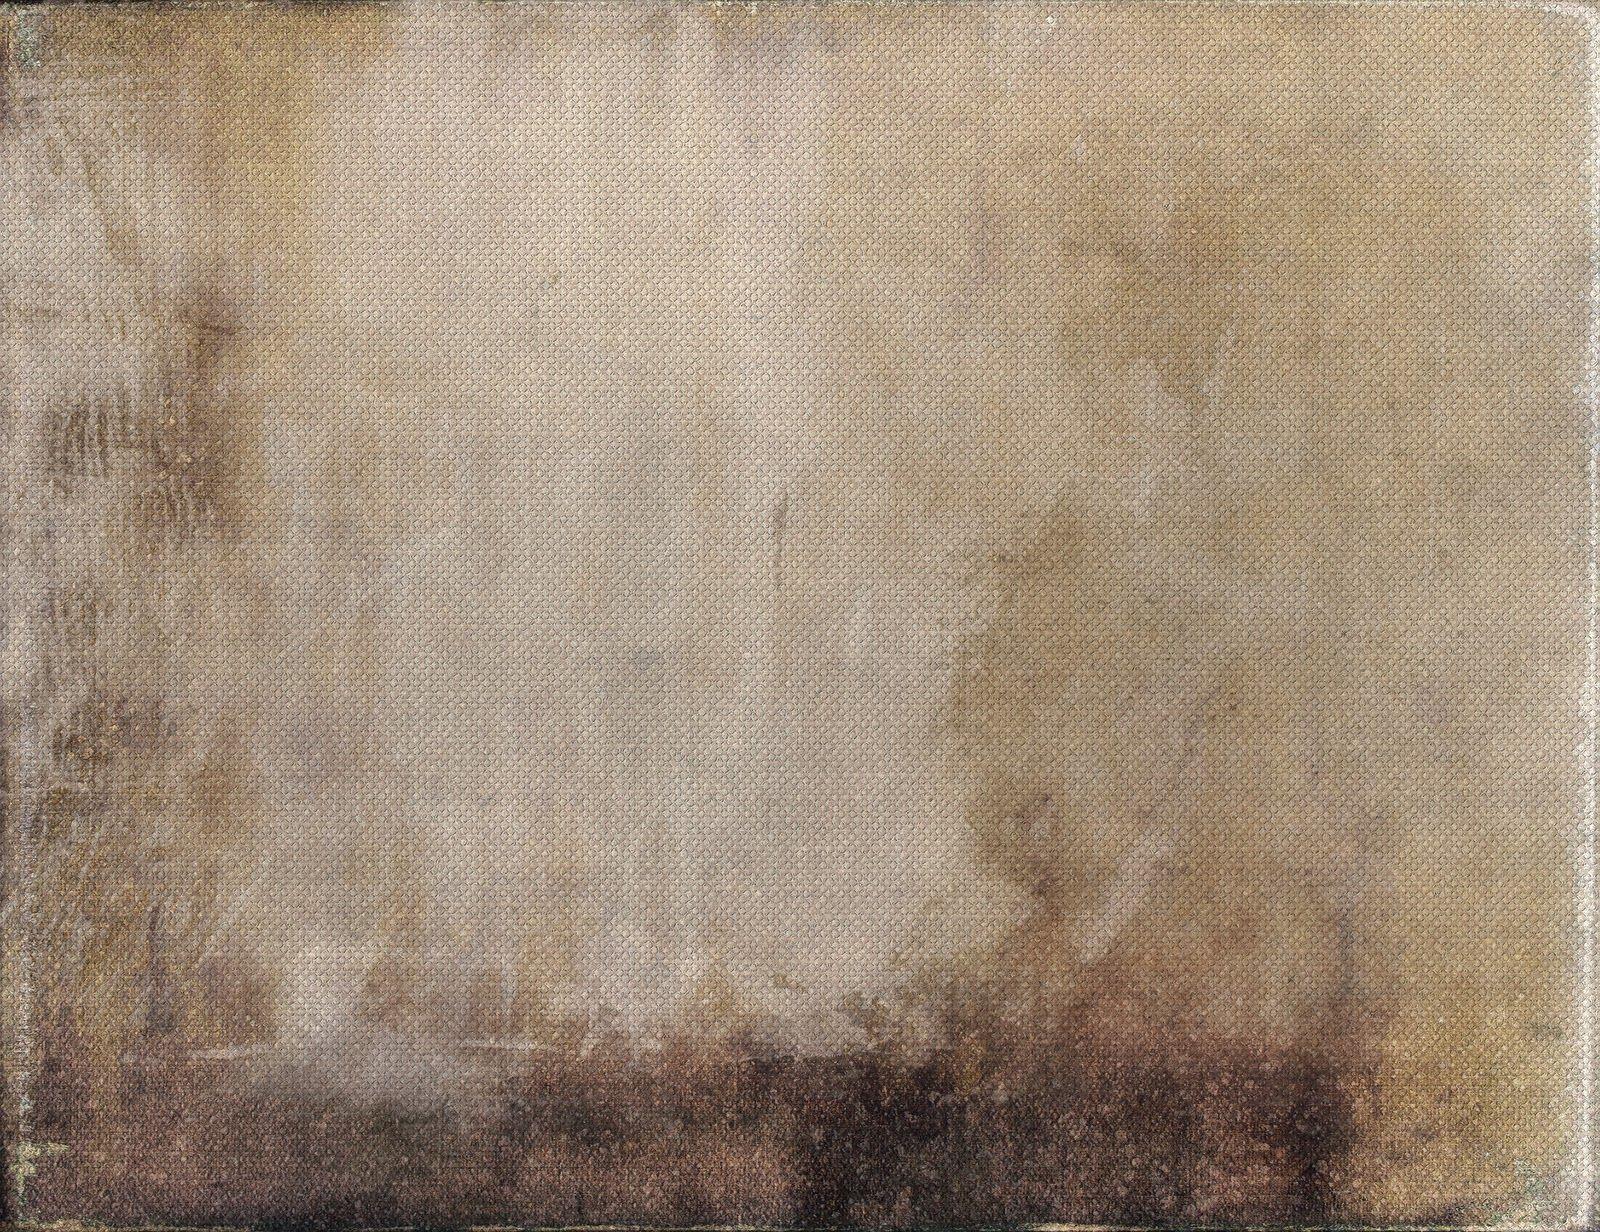 Old Canvas Texture Set Canvas Texture Diy Canvas Art Canvas